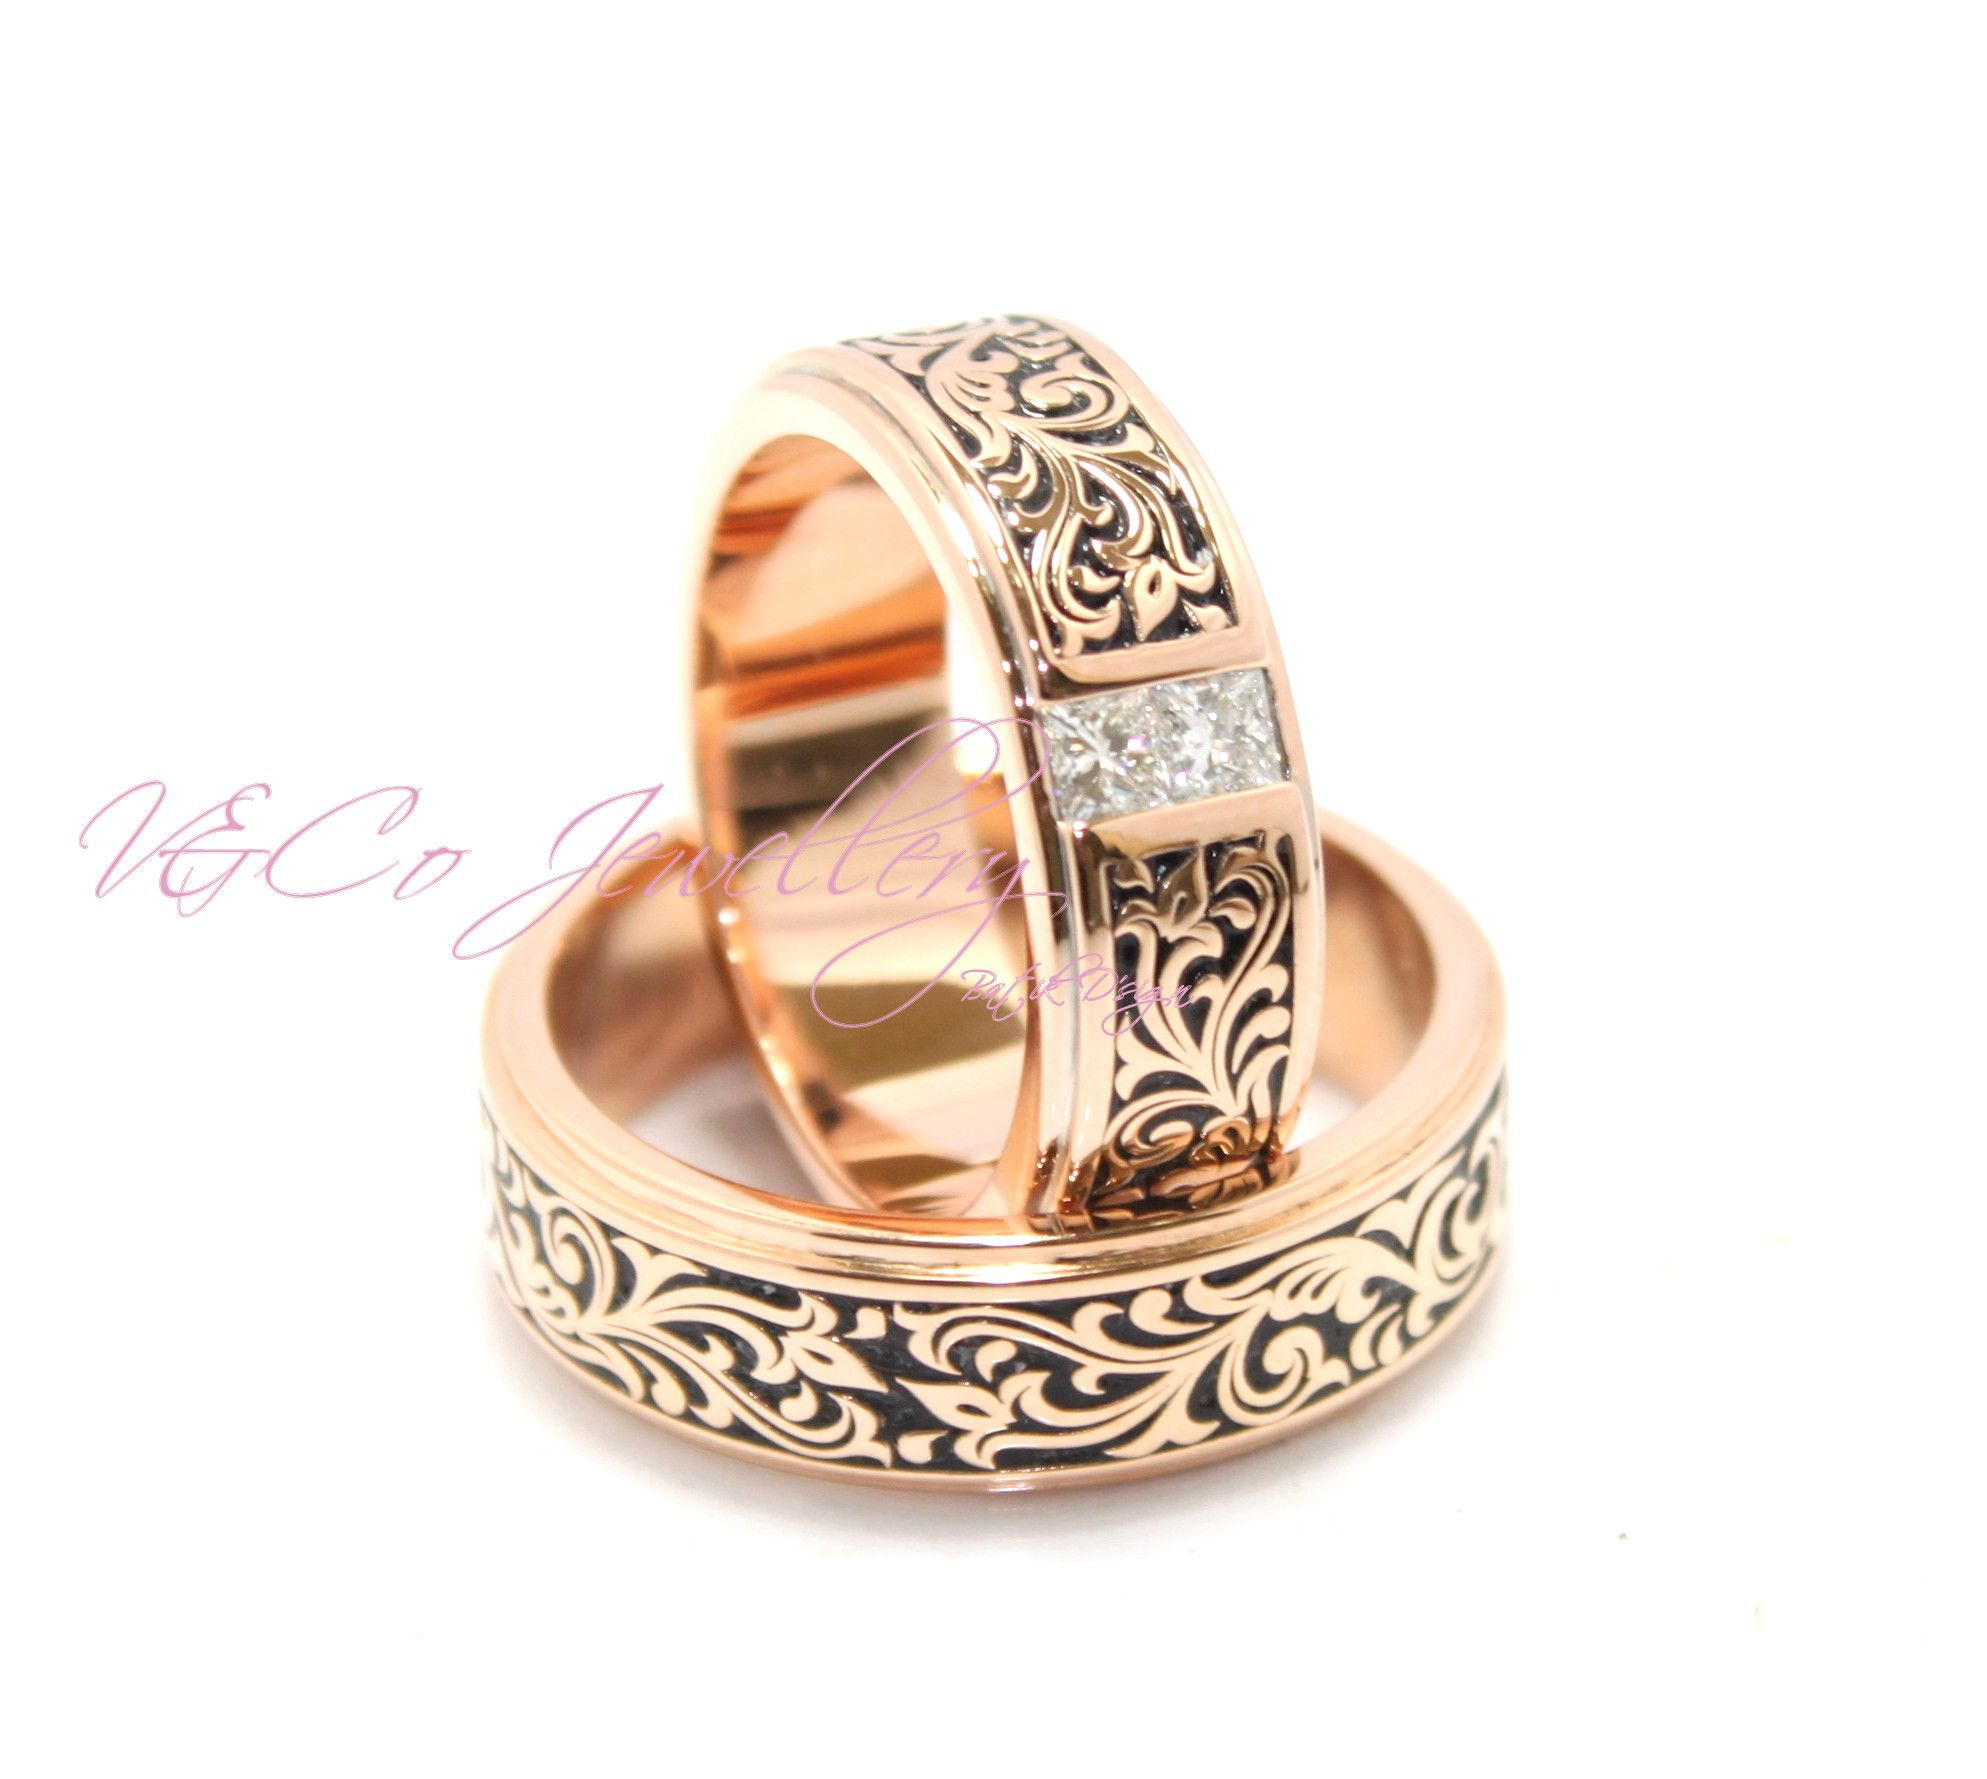 Cincin Kawin Batik Nikah Batikwedding Ring Jewellery Satu Set Jewelry Tunangan Pernikahan Berlian Emas Wedding Round Custom Find Us Instagram Vncojewellery Website